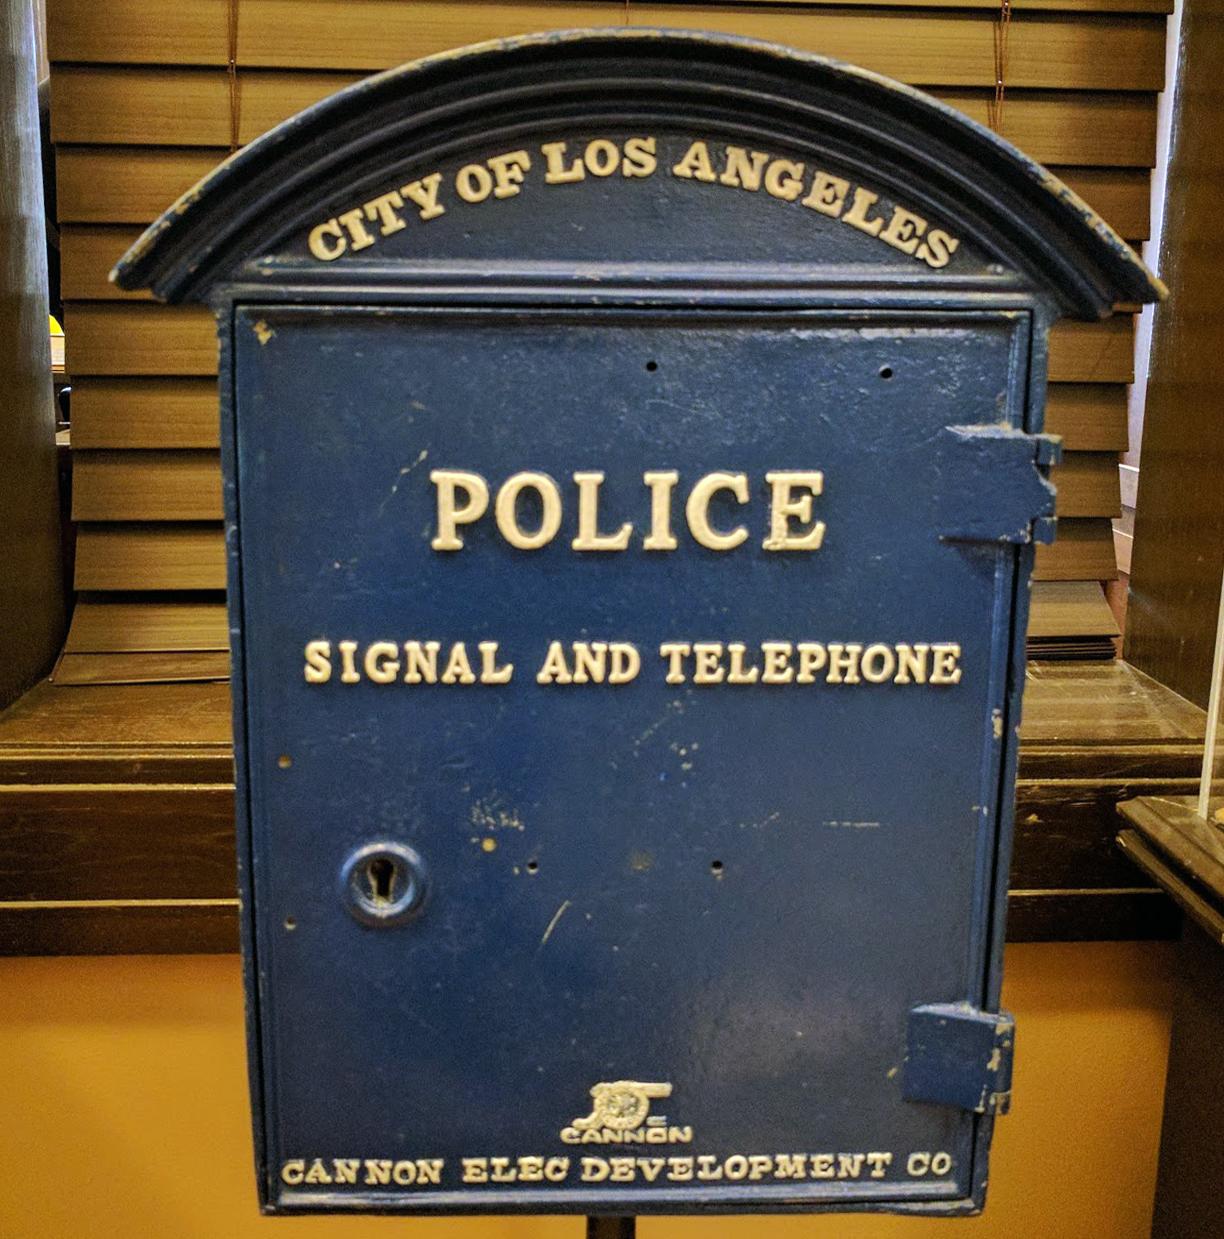 LAPD museum phone box michele roohani